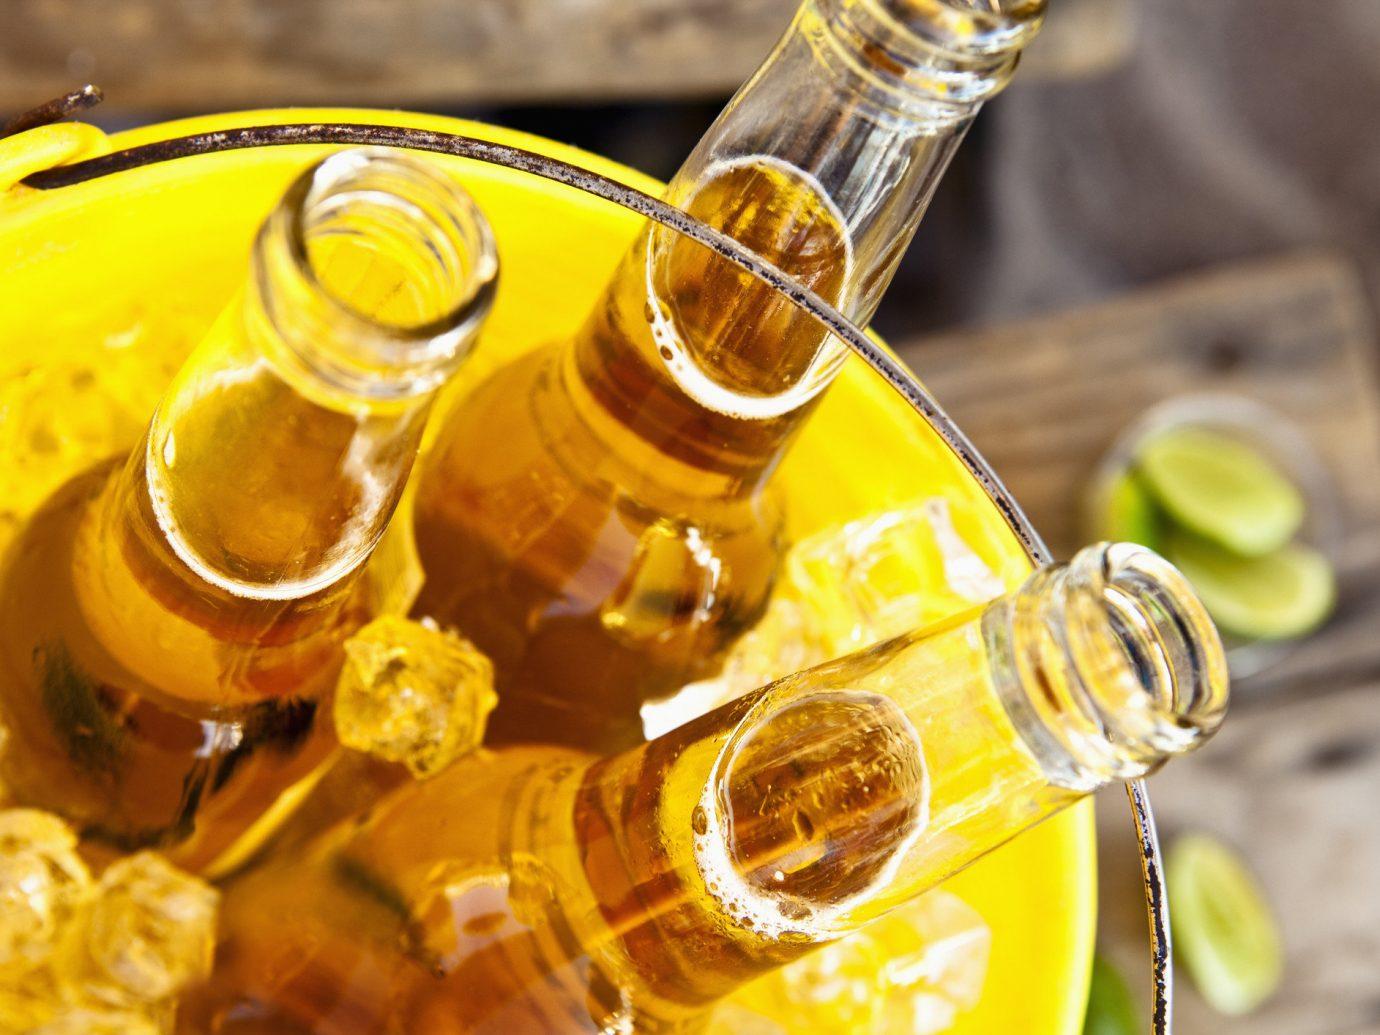 Food + Drink yellow liqueur alcoholic beverage distilled beverage food alcohol land plant Drink produce wine macro photography flowering plant bottle oil honey